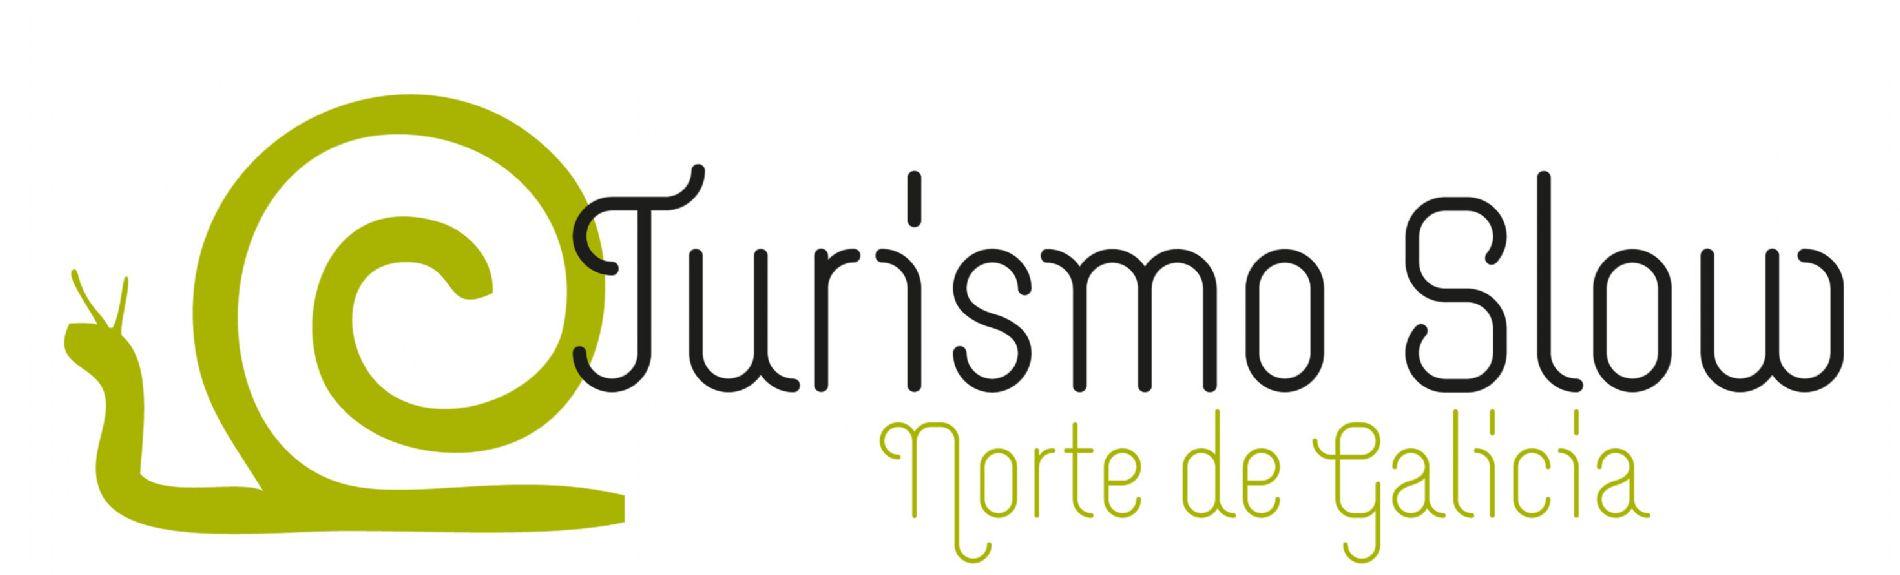 Galicia Turismo Slow